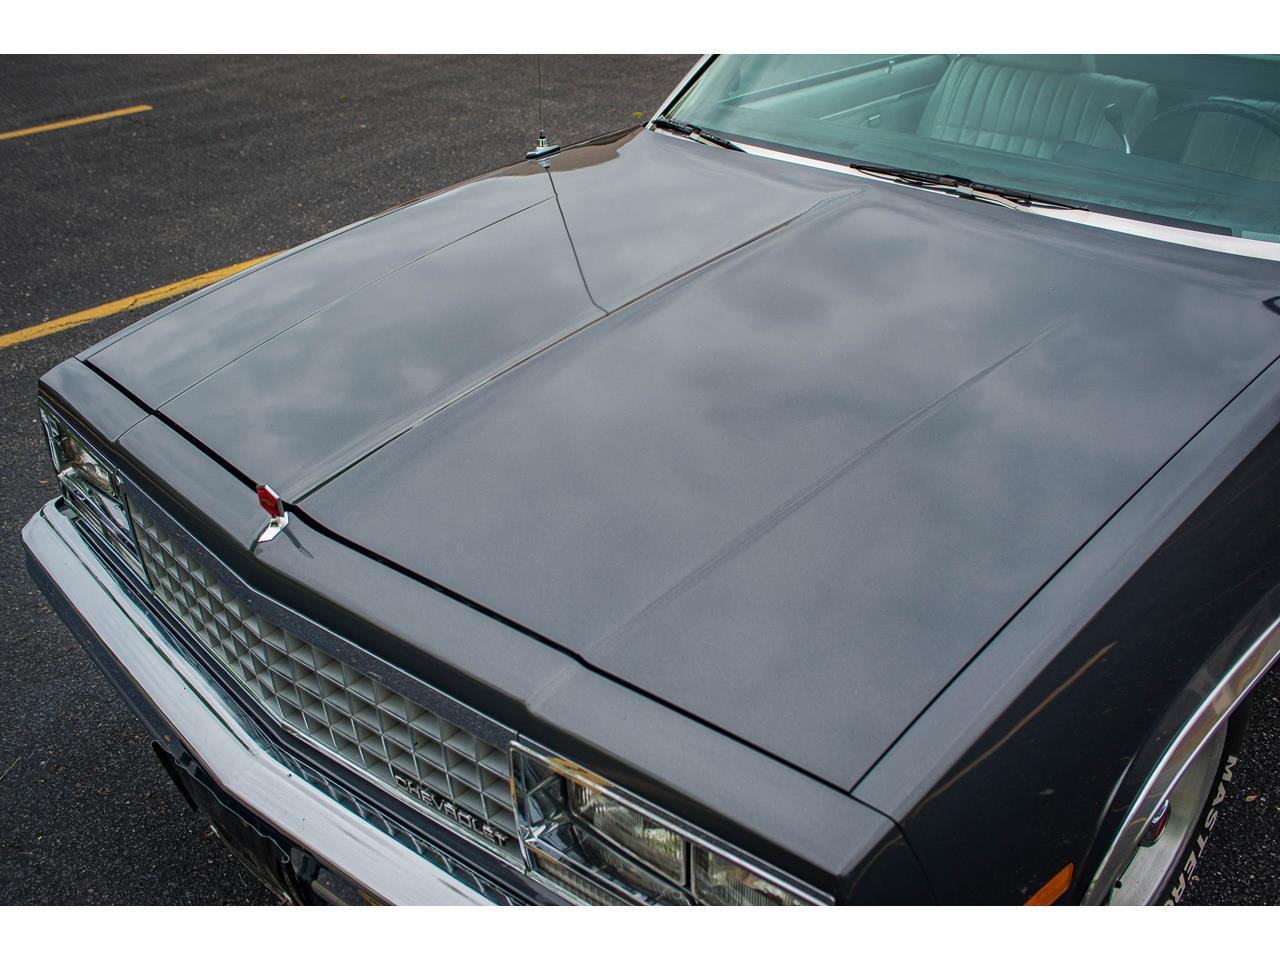 Large Picture of '82 El Camino - $13,000.00 - QB9A